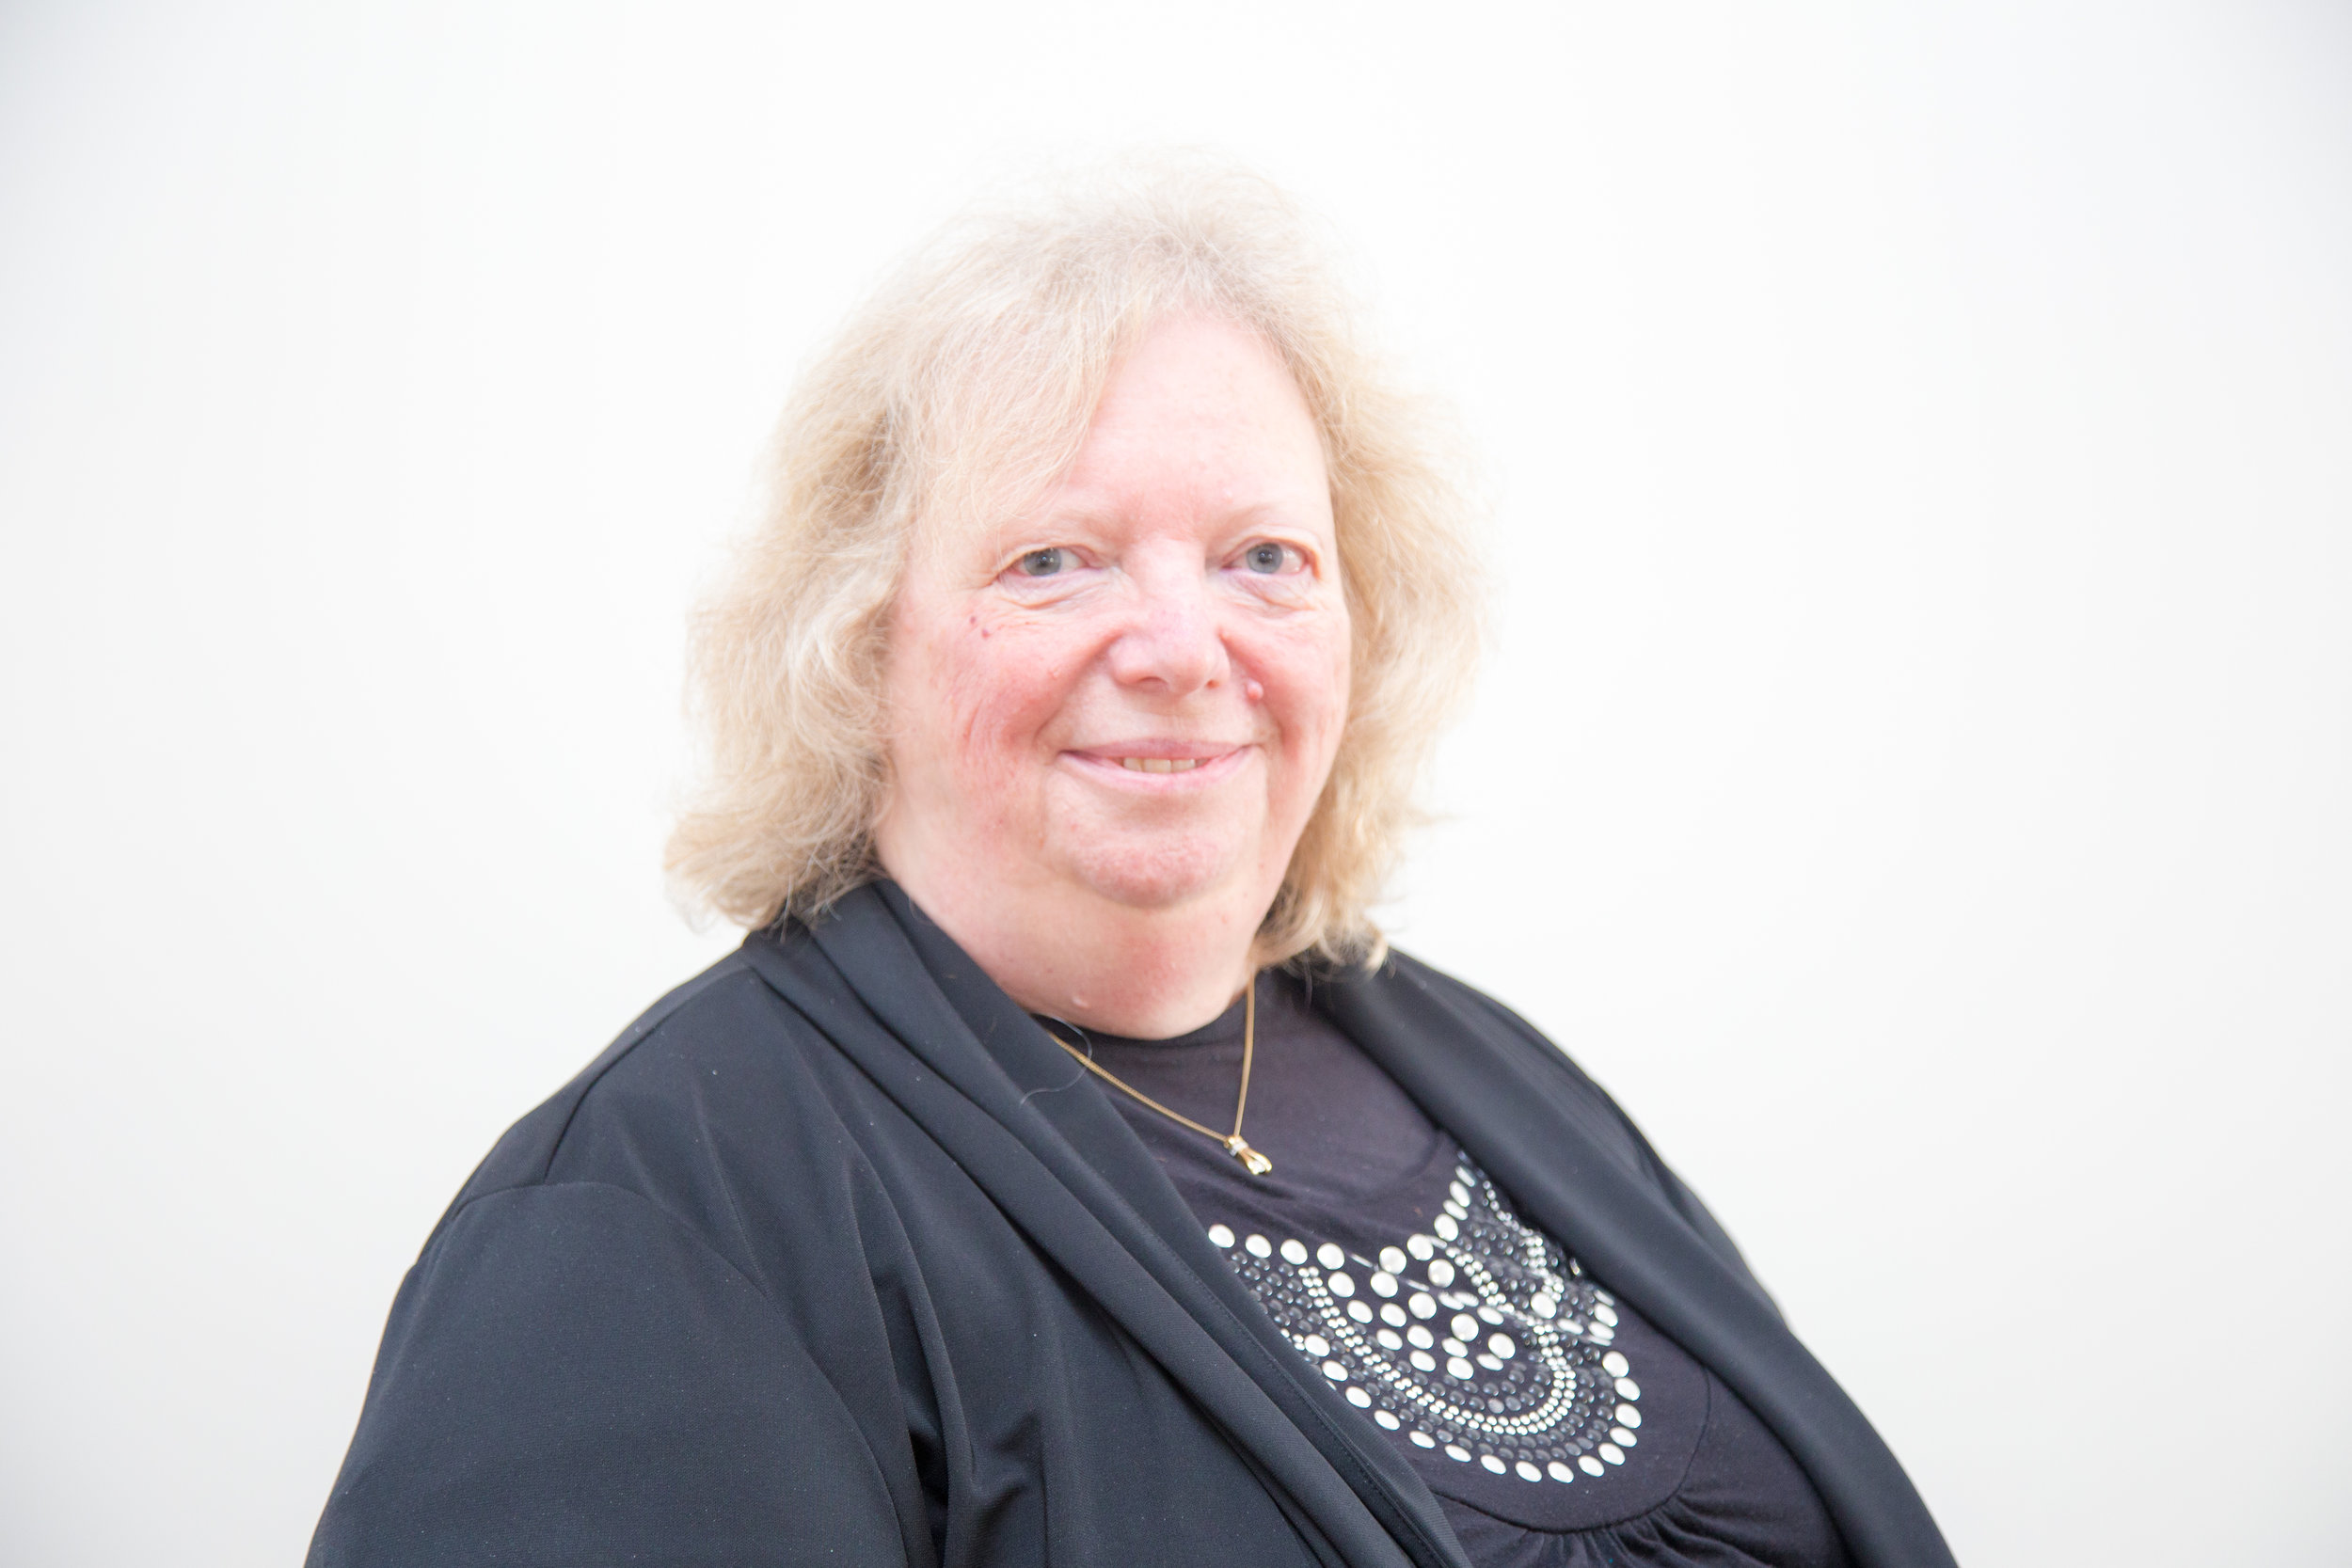 Judy Birchall — Wills, Probate, Powers of Attorney